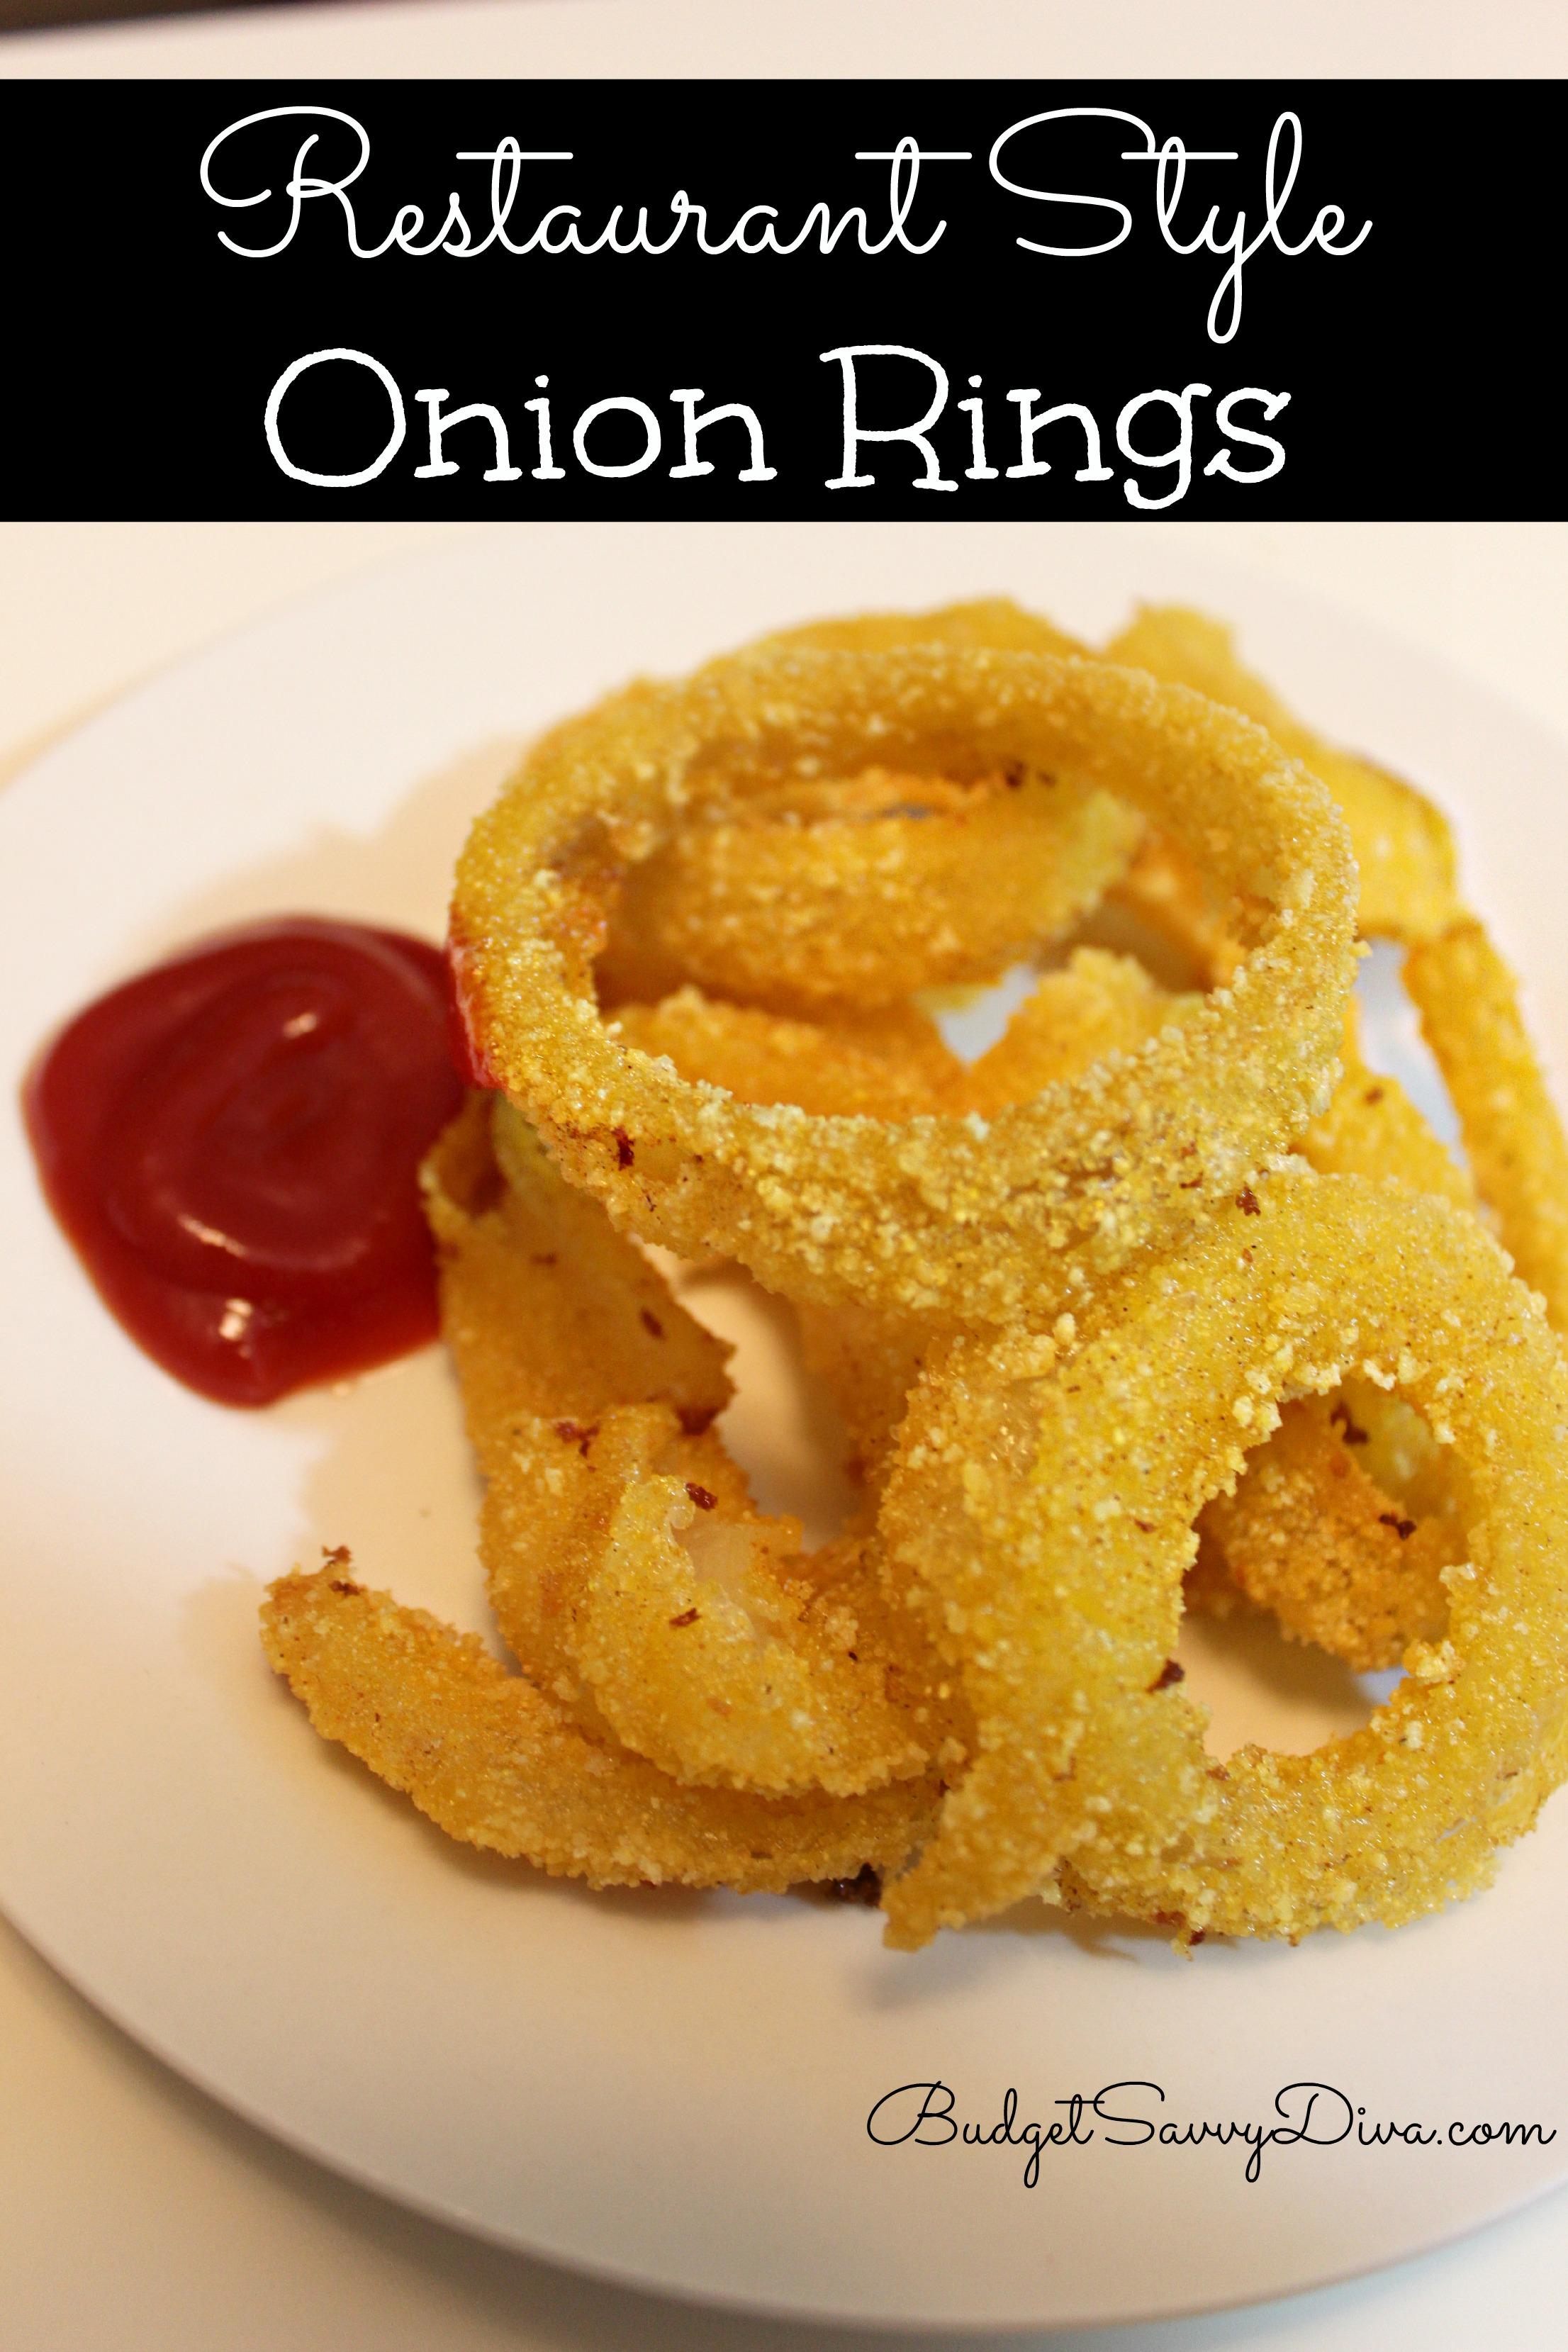 Restaurant Style Onion Rings Recipe Budget Savvy Diva